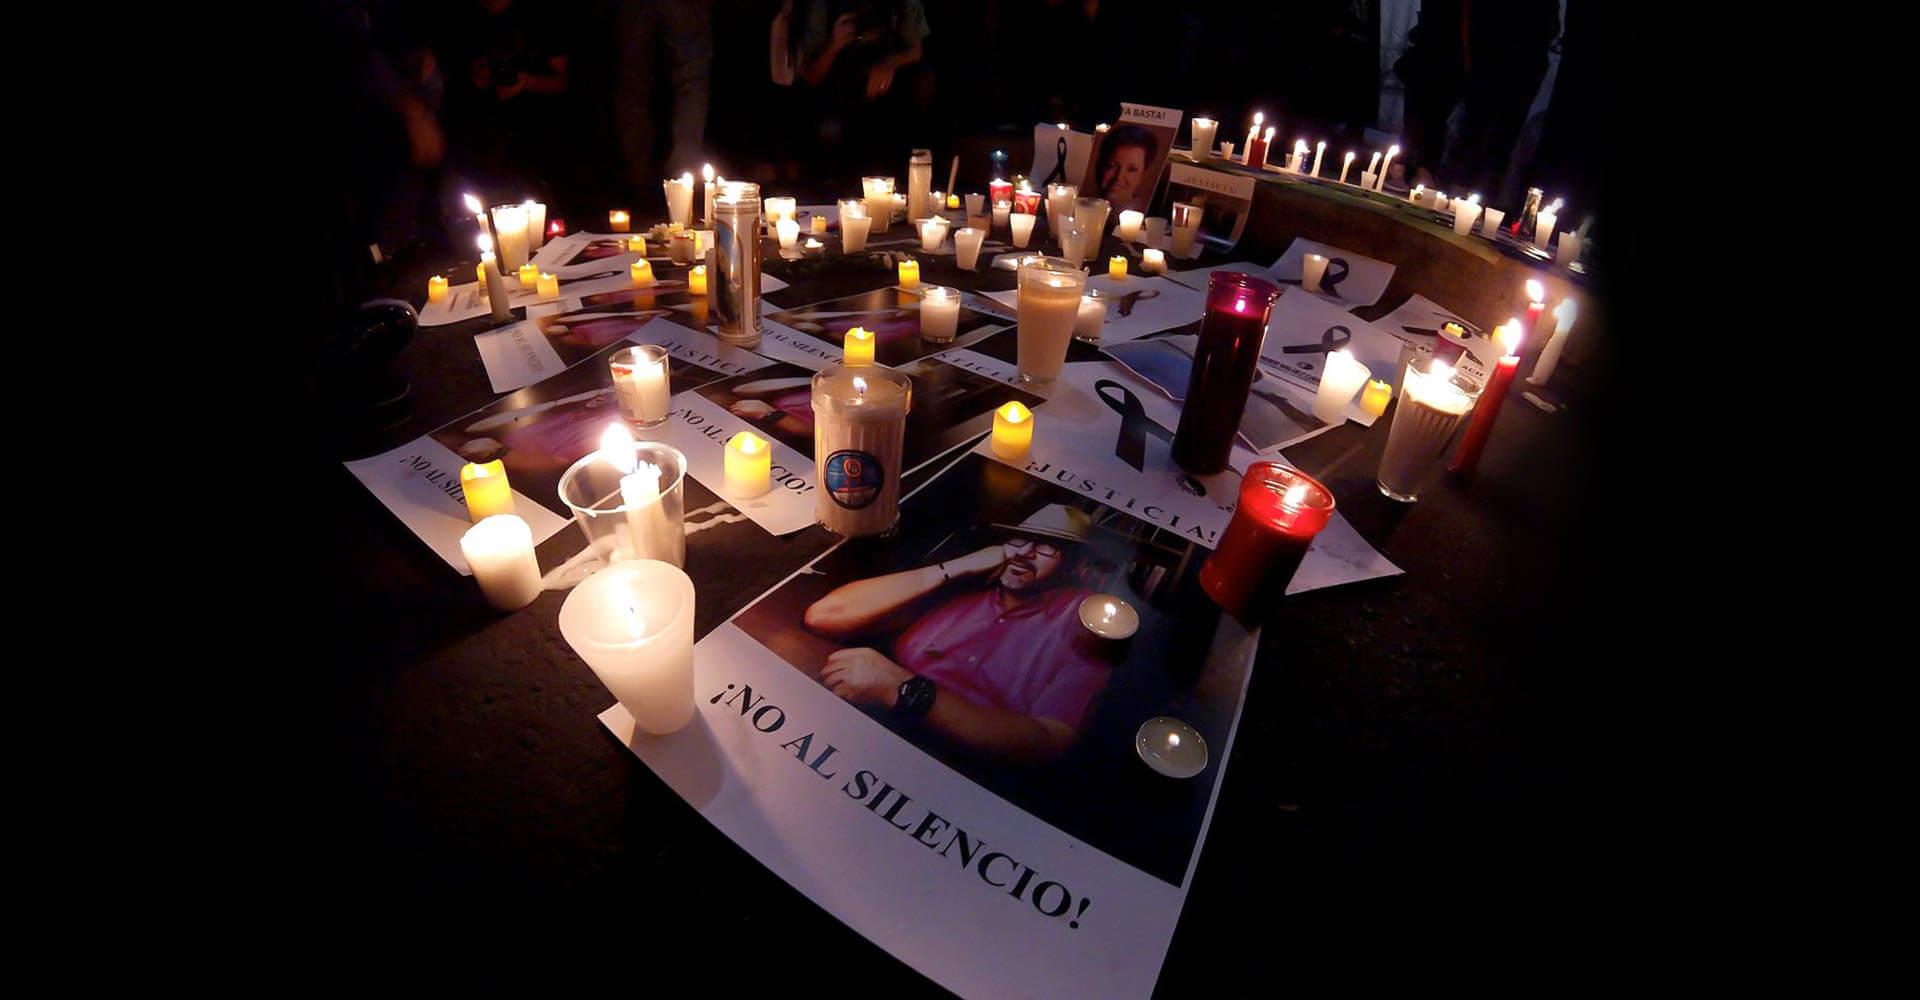 Europa, alivio para periodistas mexicanos en riesgo